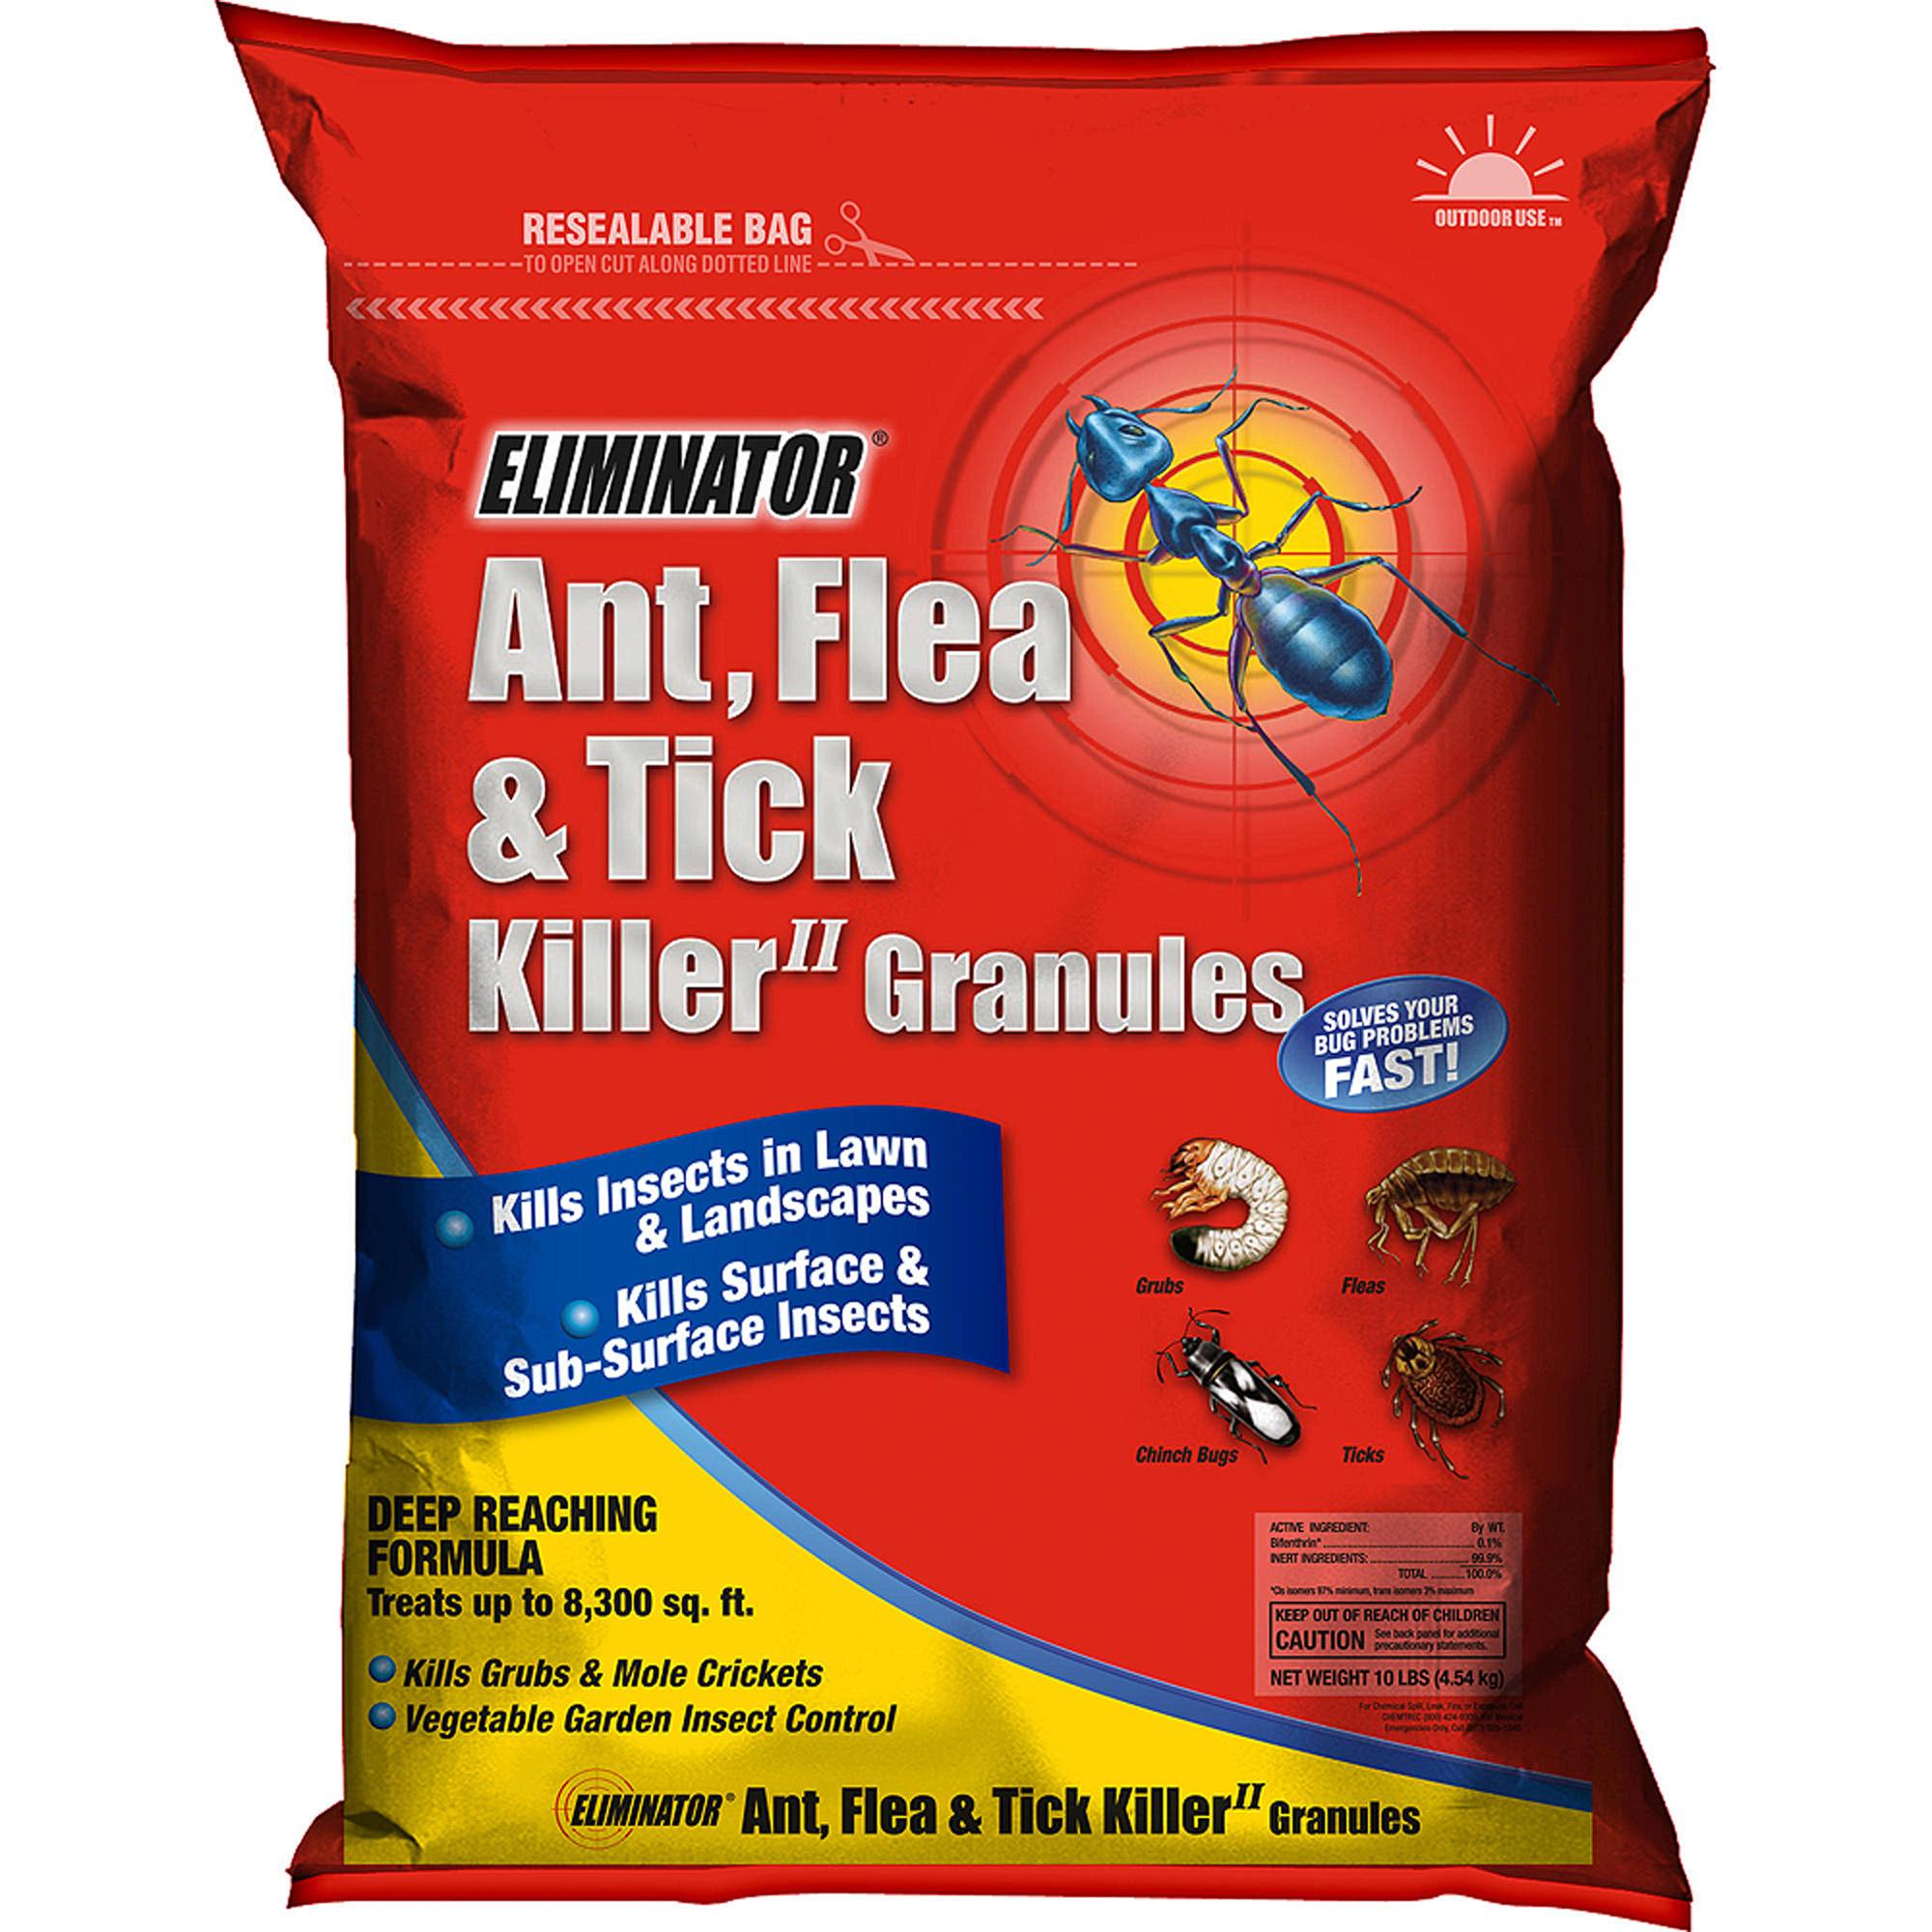 Eliminator Ant, Flea And Tick Killer Ii Granules Yard Insect Killer,